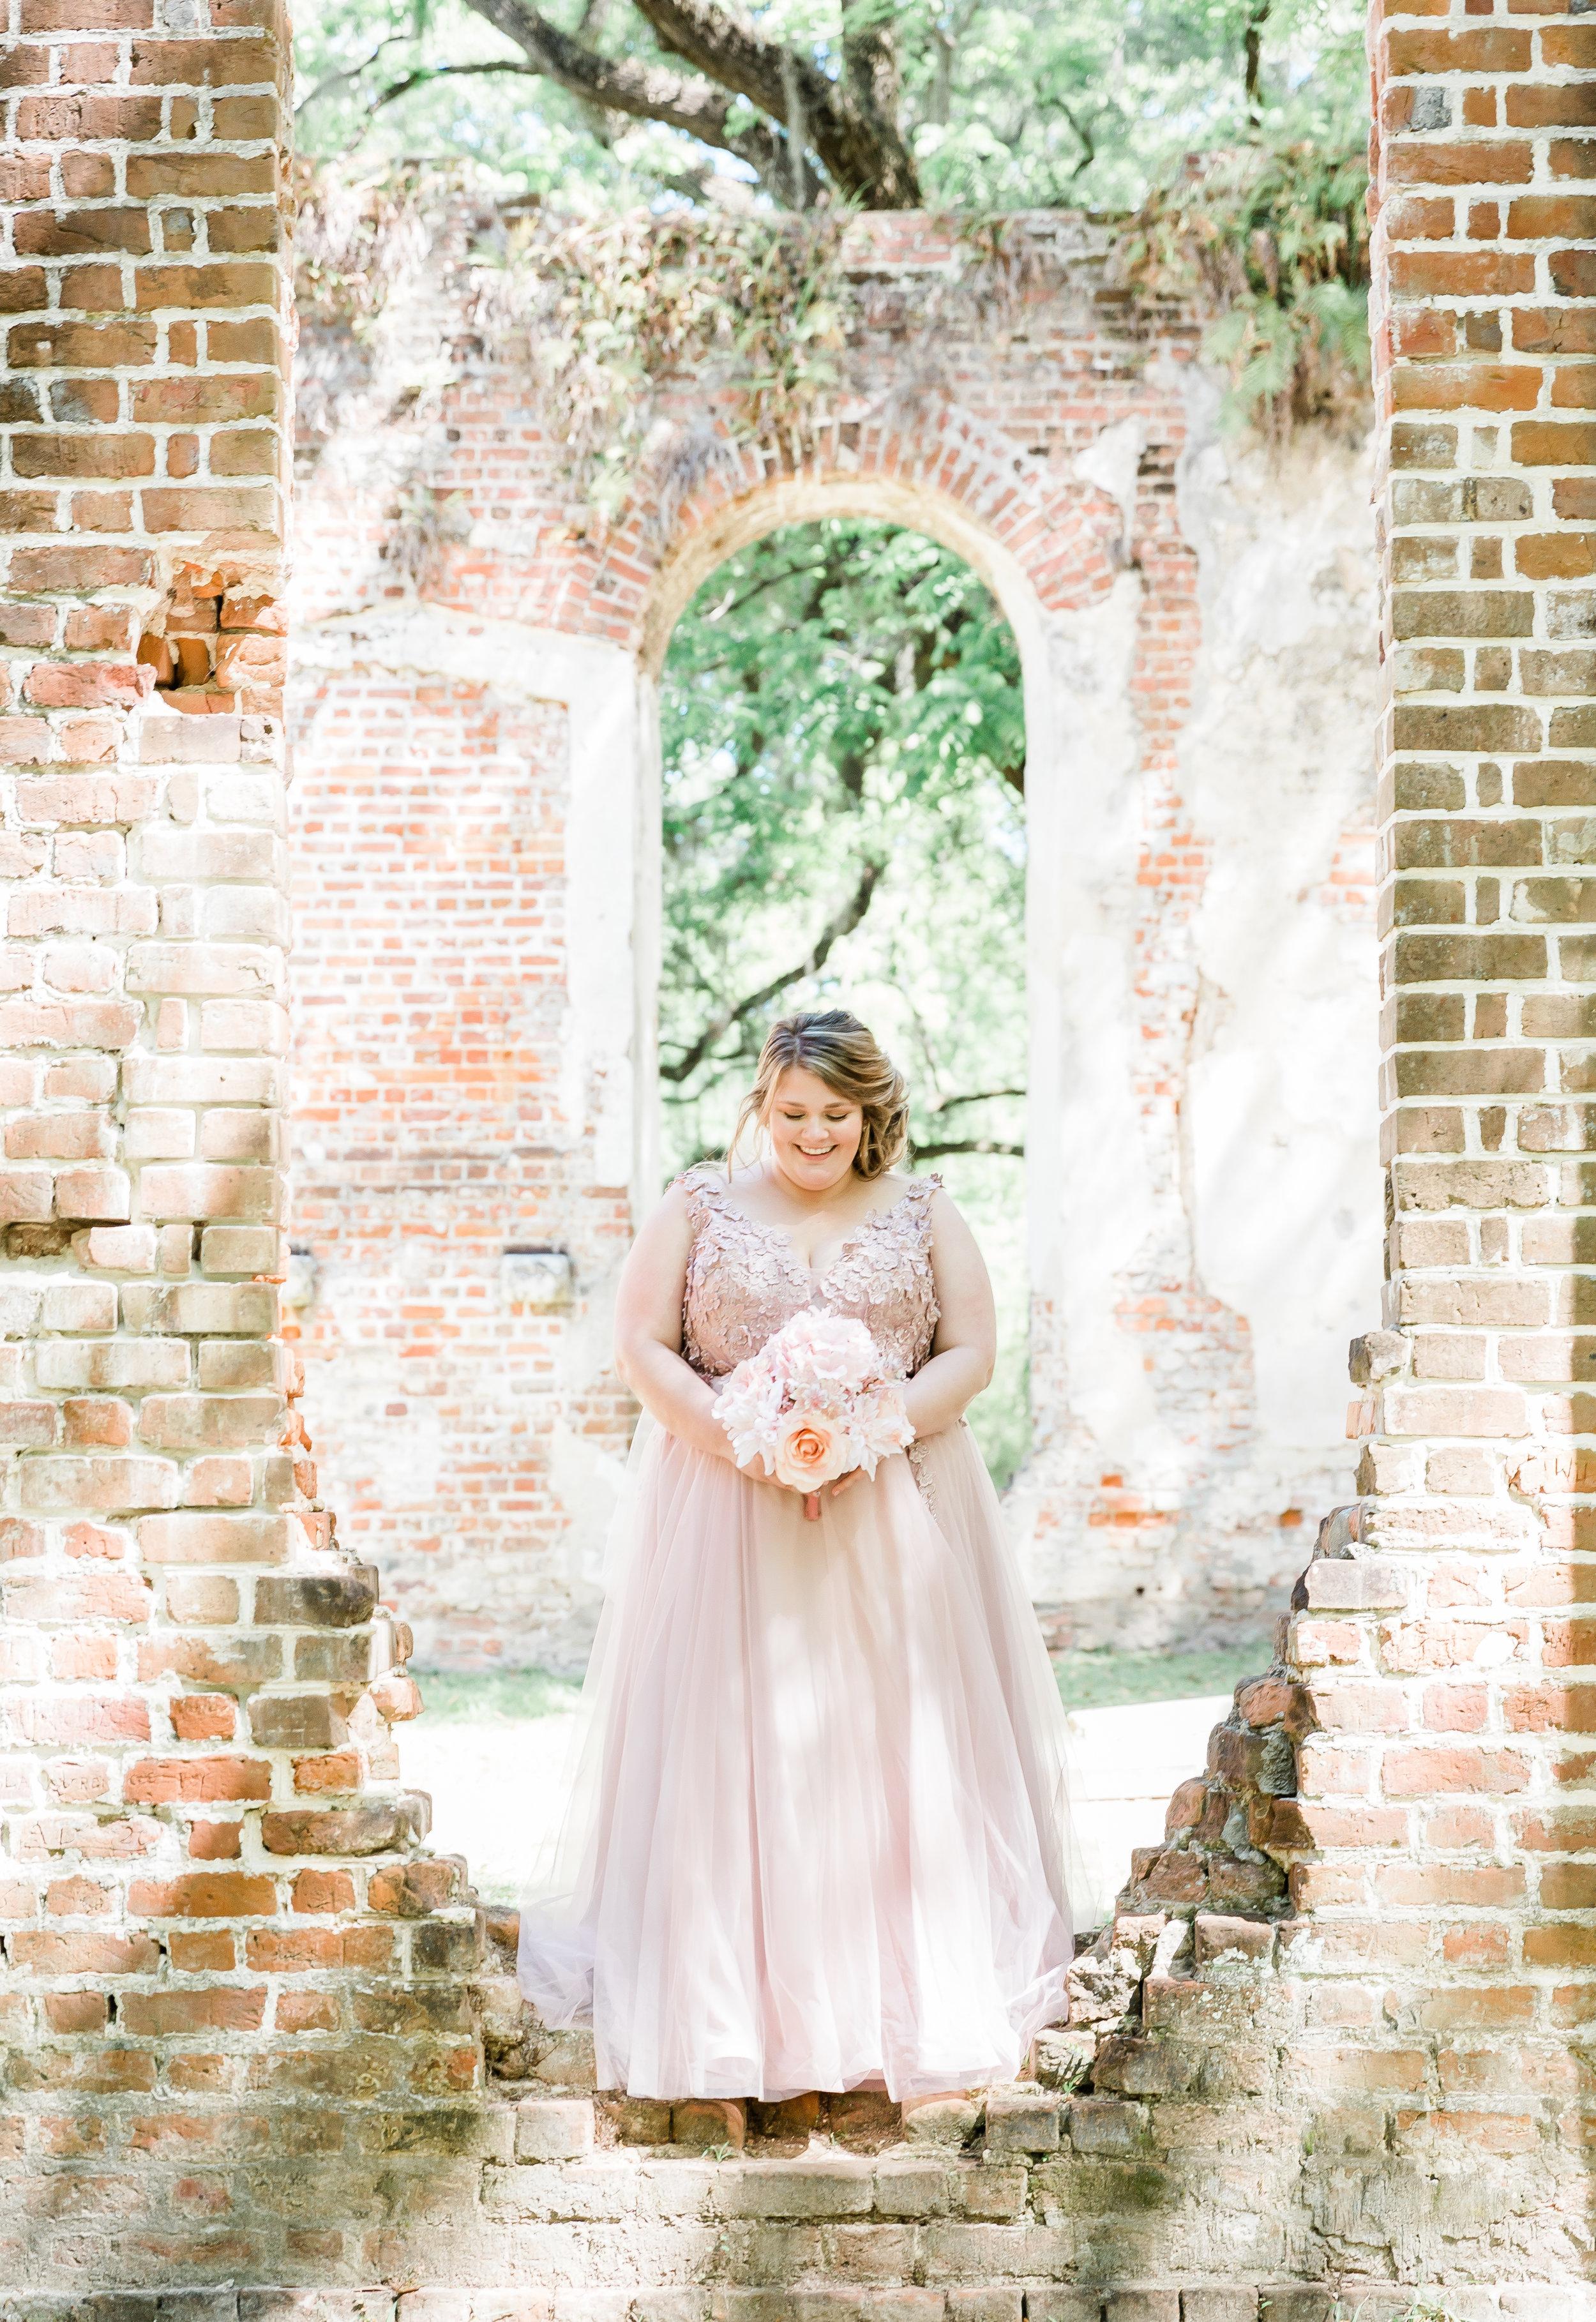 20190417-Southern Lens Photography-savannah family photographer- Ashley and Zack-old sheldon church ruins-201933.jpg